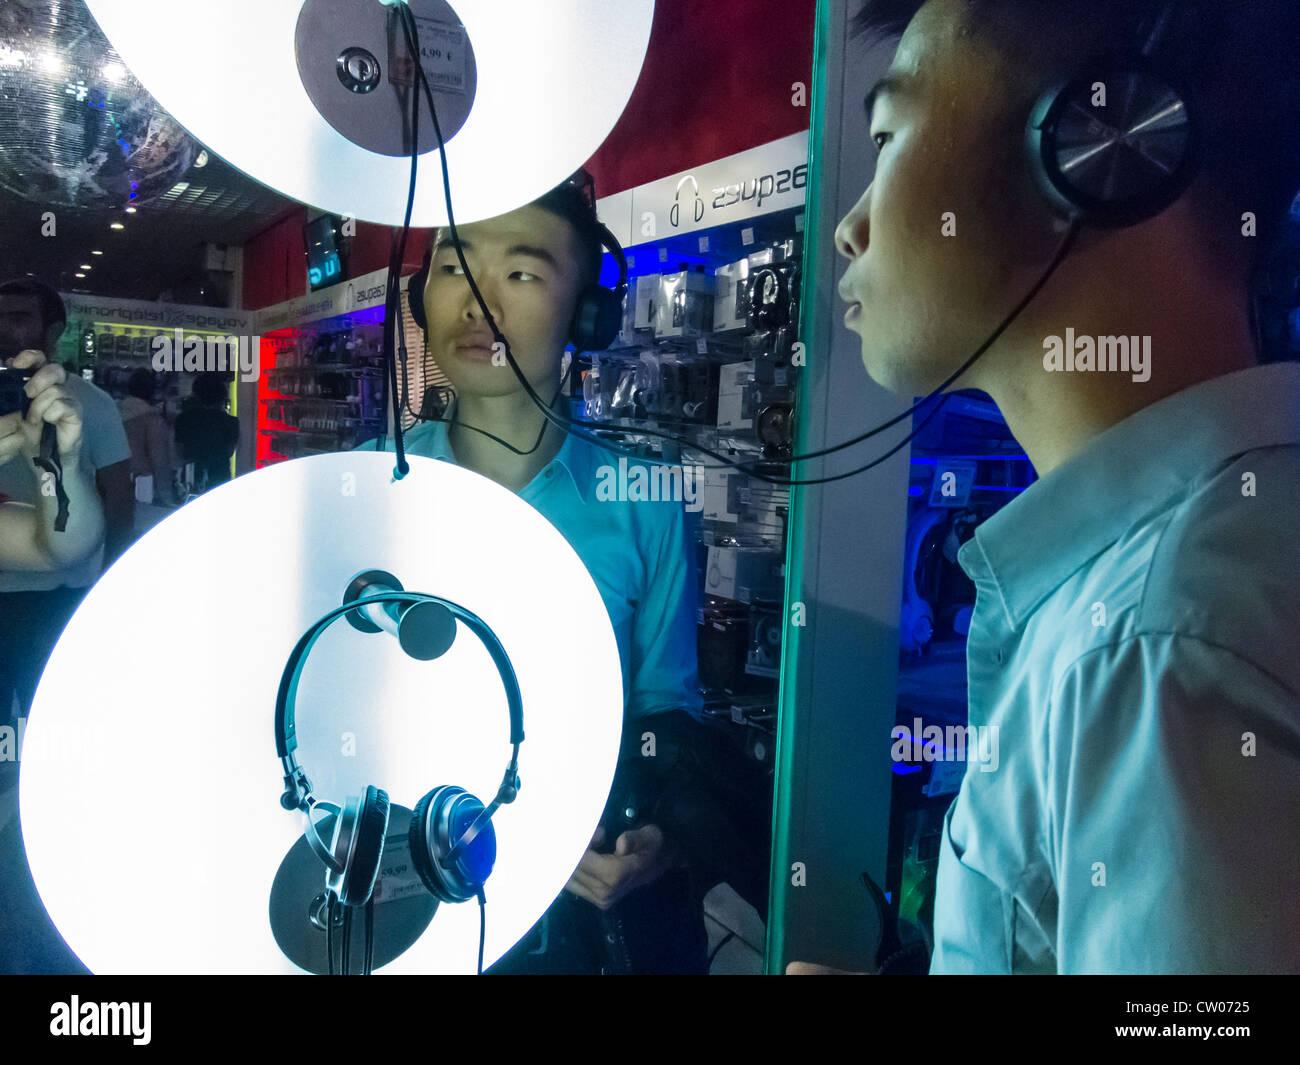 Paris, France, Young Chinese Man Shopping inside Virgin Megastore, Media Technology,Listening to Music on Headphones - Stock Image